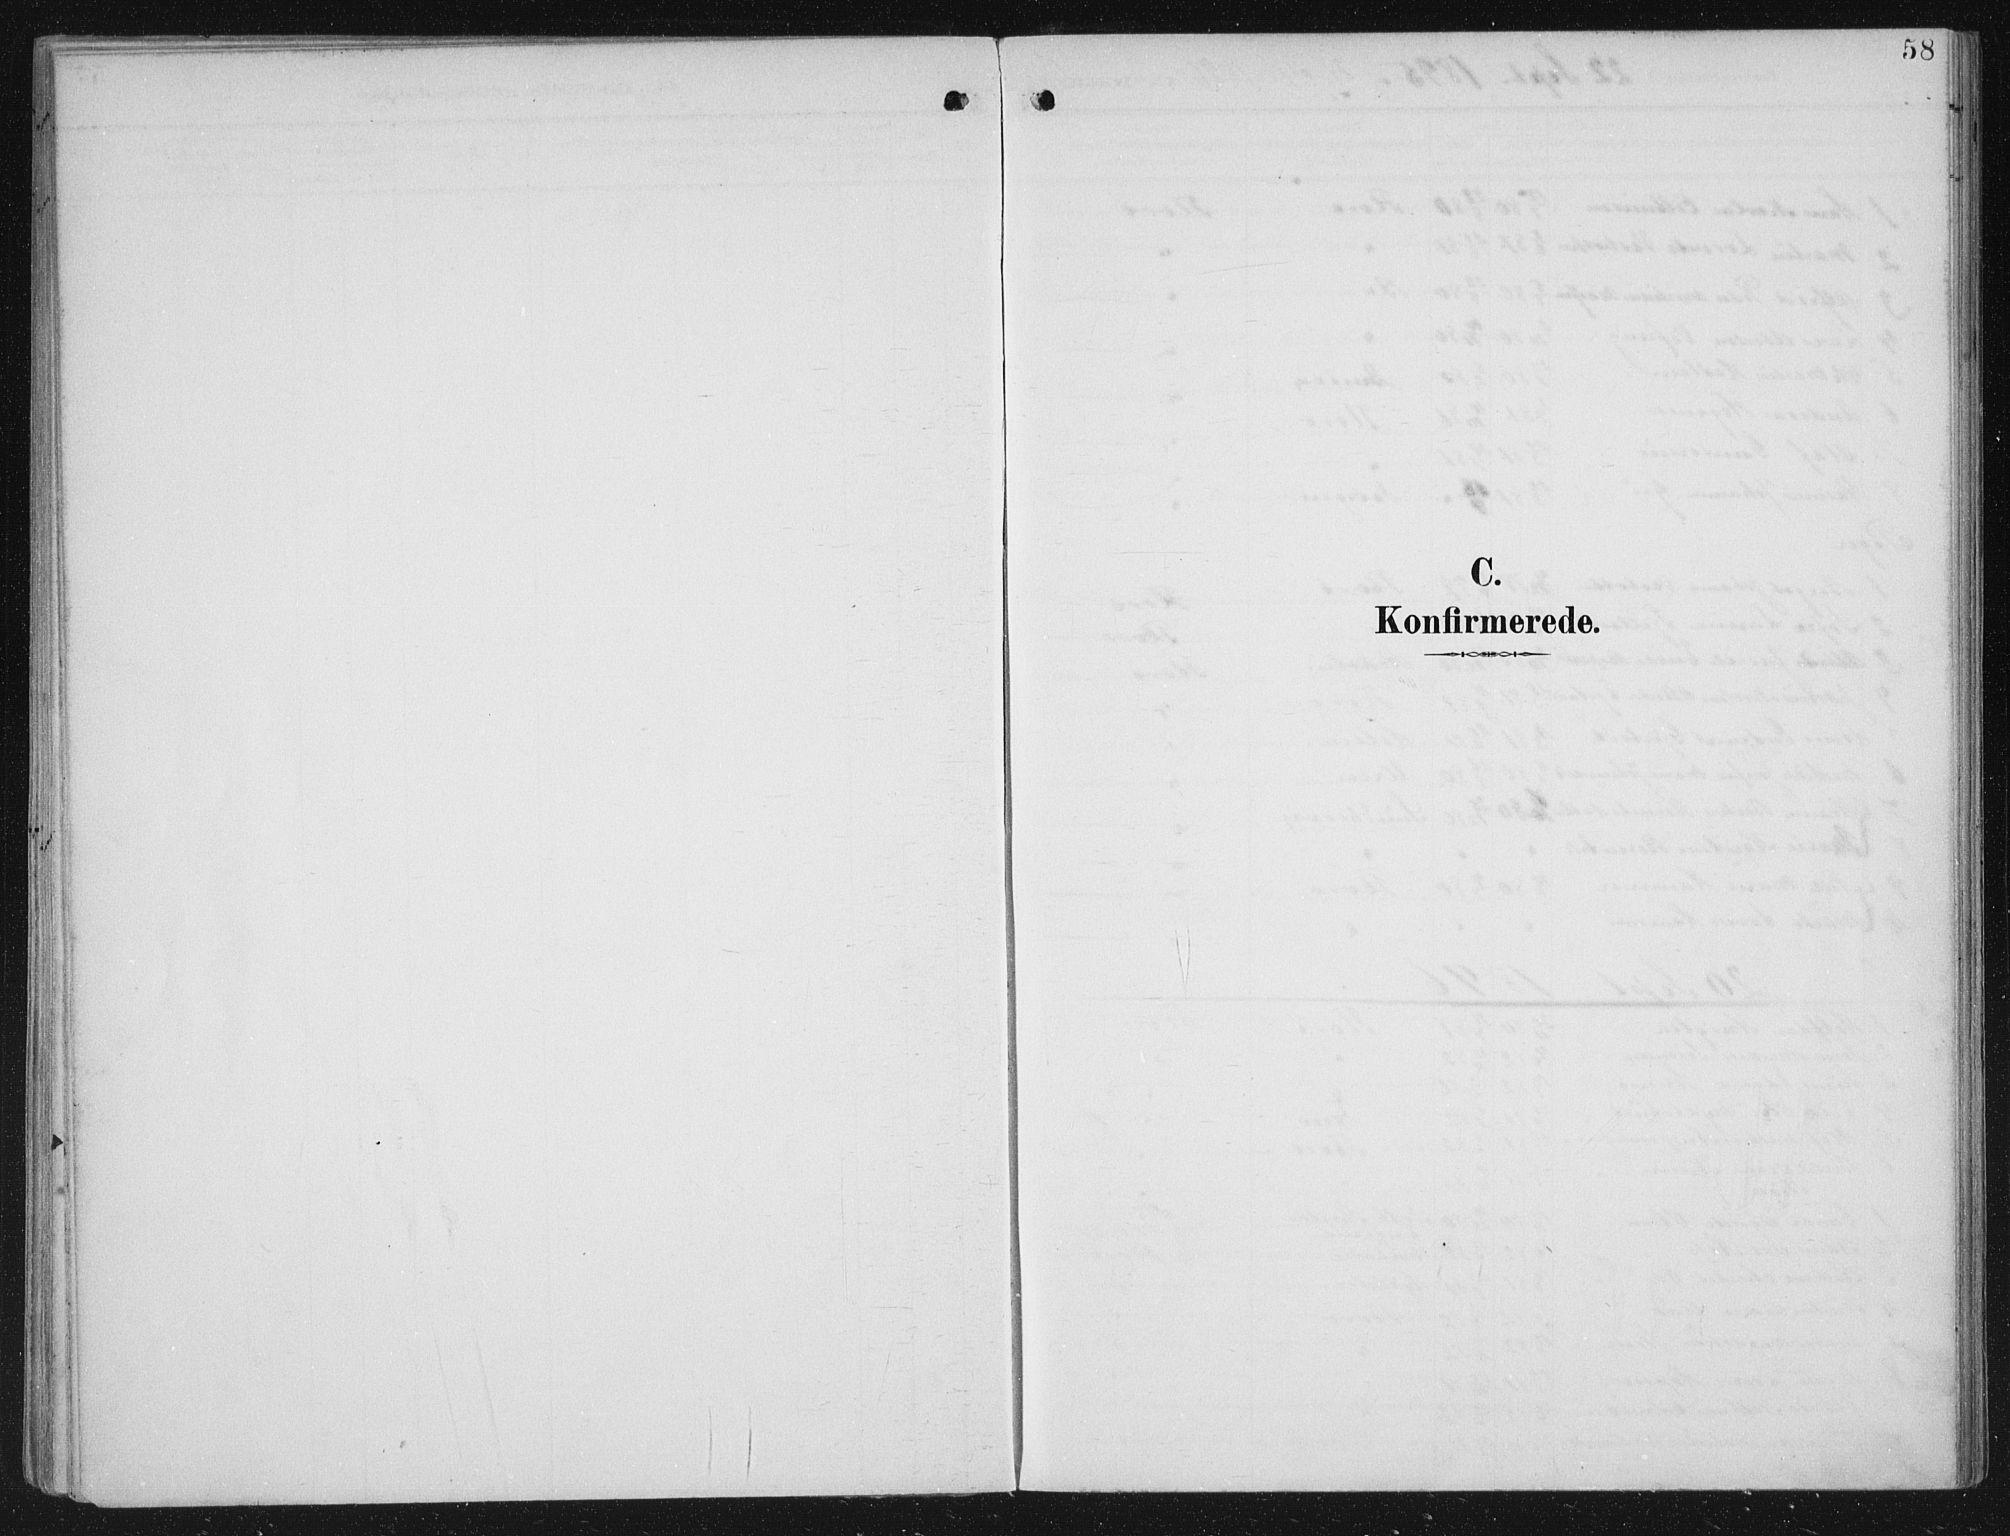 SAB, Kinn sokneprestembete, H/Haa/Haac/L0002: Parish register (official) no. C  2, 1895-1916, p. 58